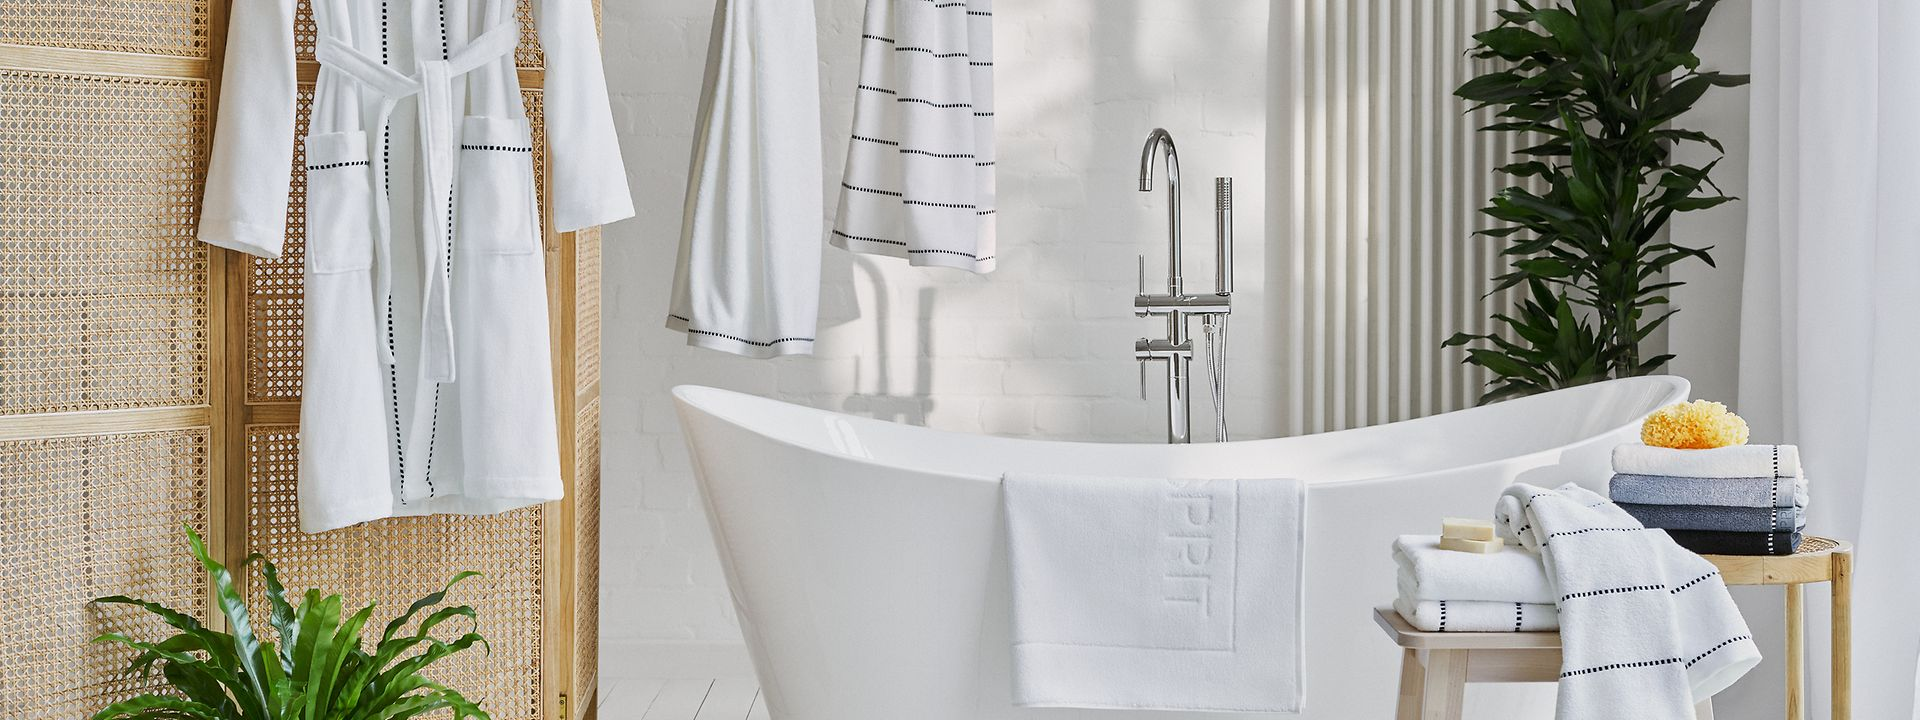 082021 - home - hero banner - bathroom - IMG